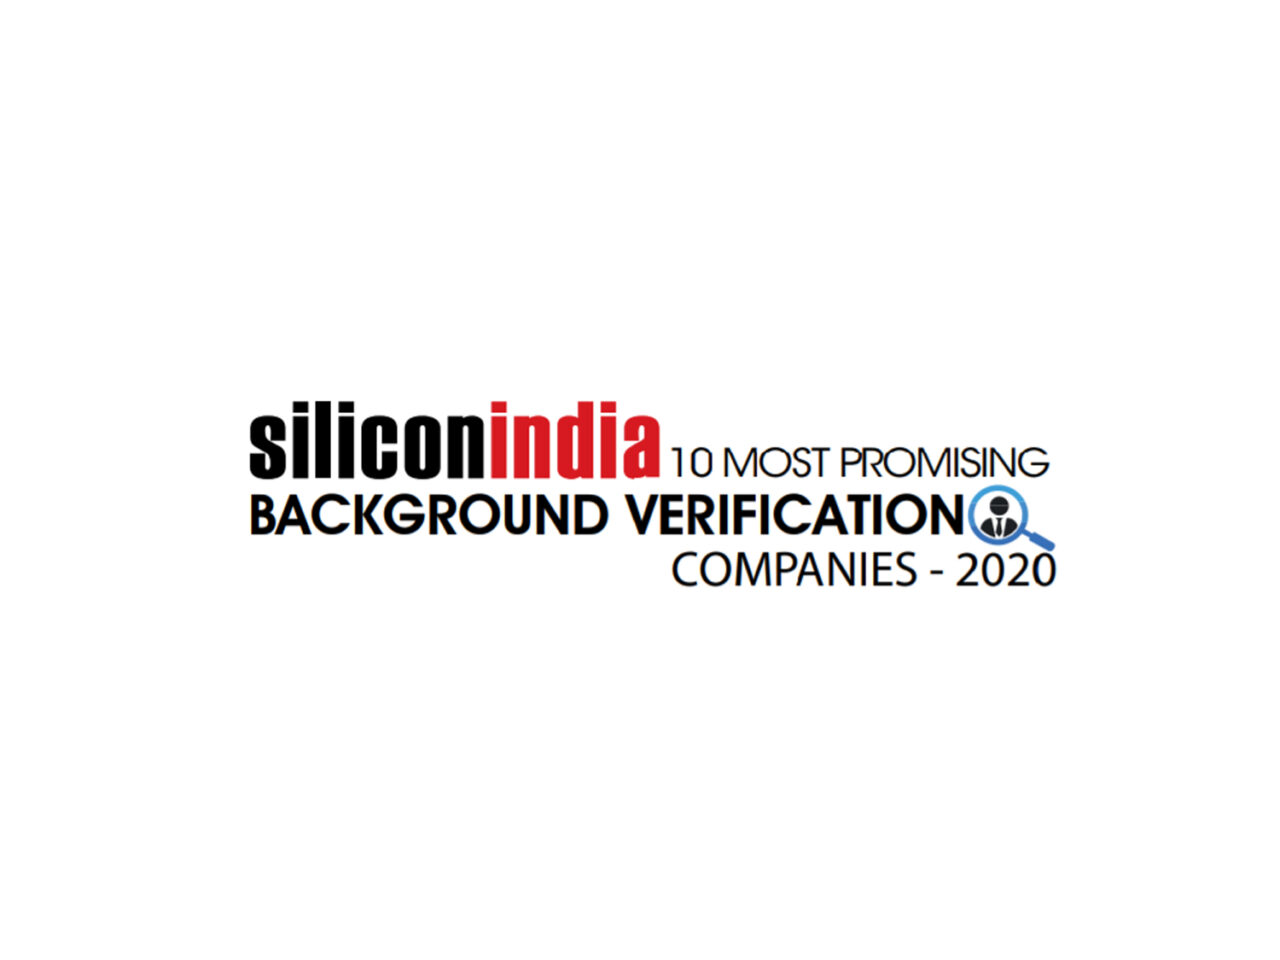 https://genesisrms.com/wp-content/uploads/2021/08/silicon-1280x960.jpg